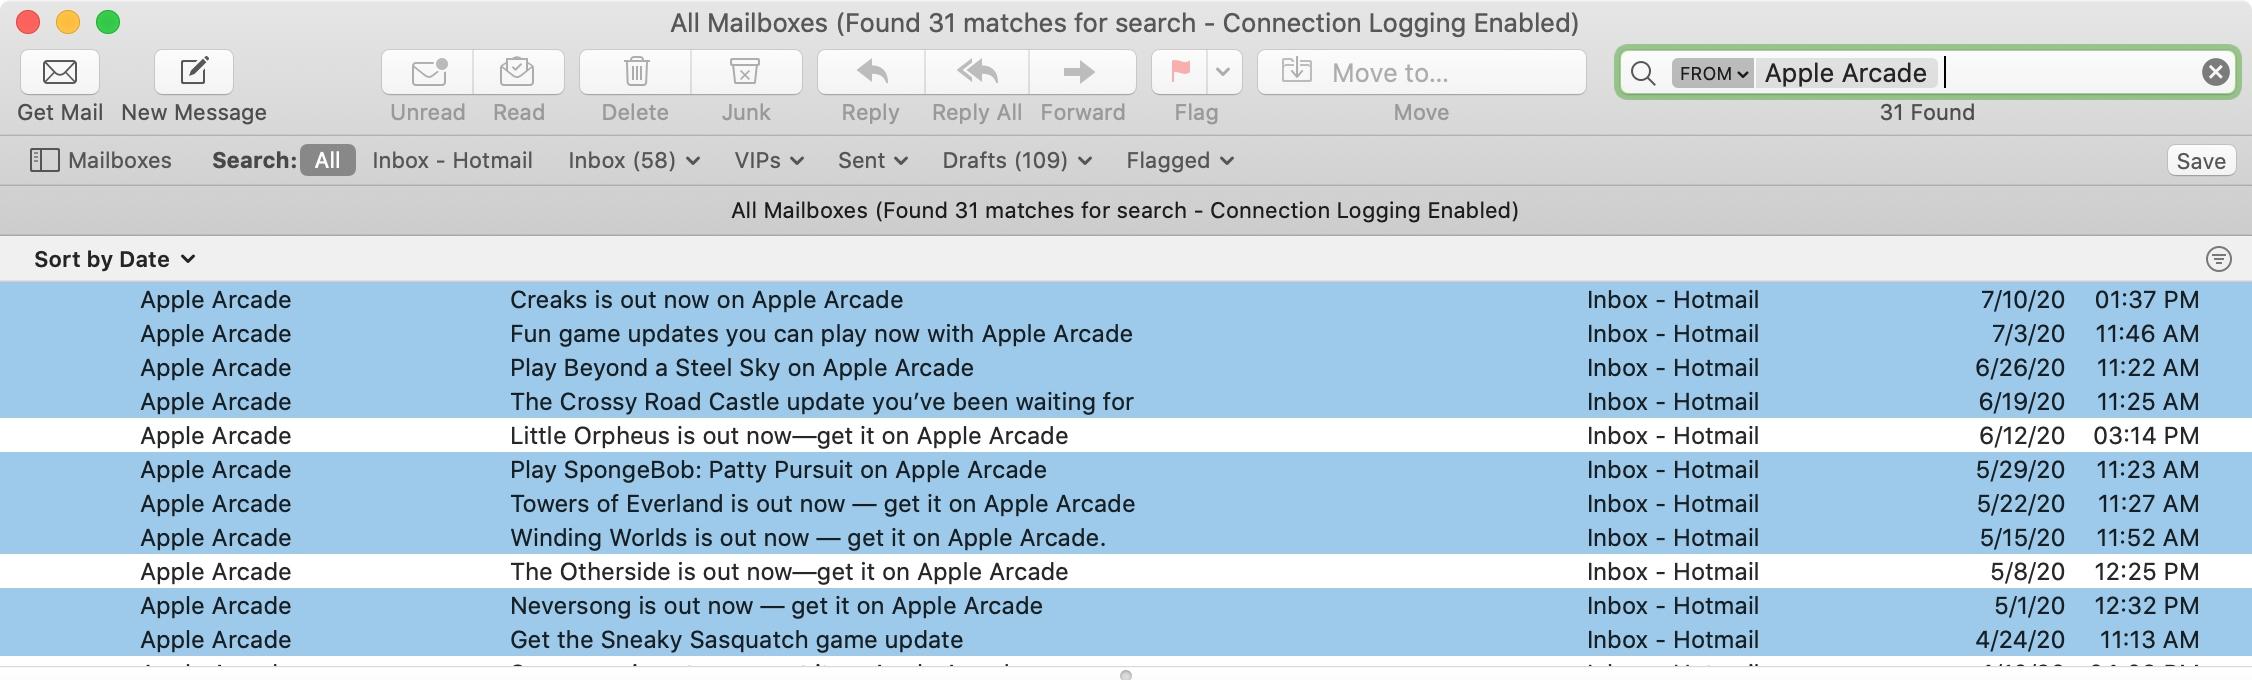 Mac Mail Search Apple Arcade